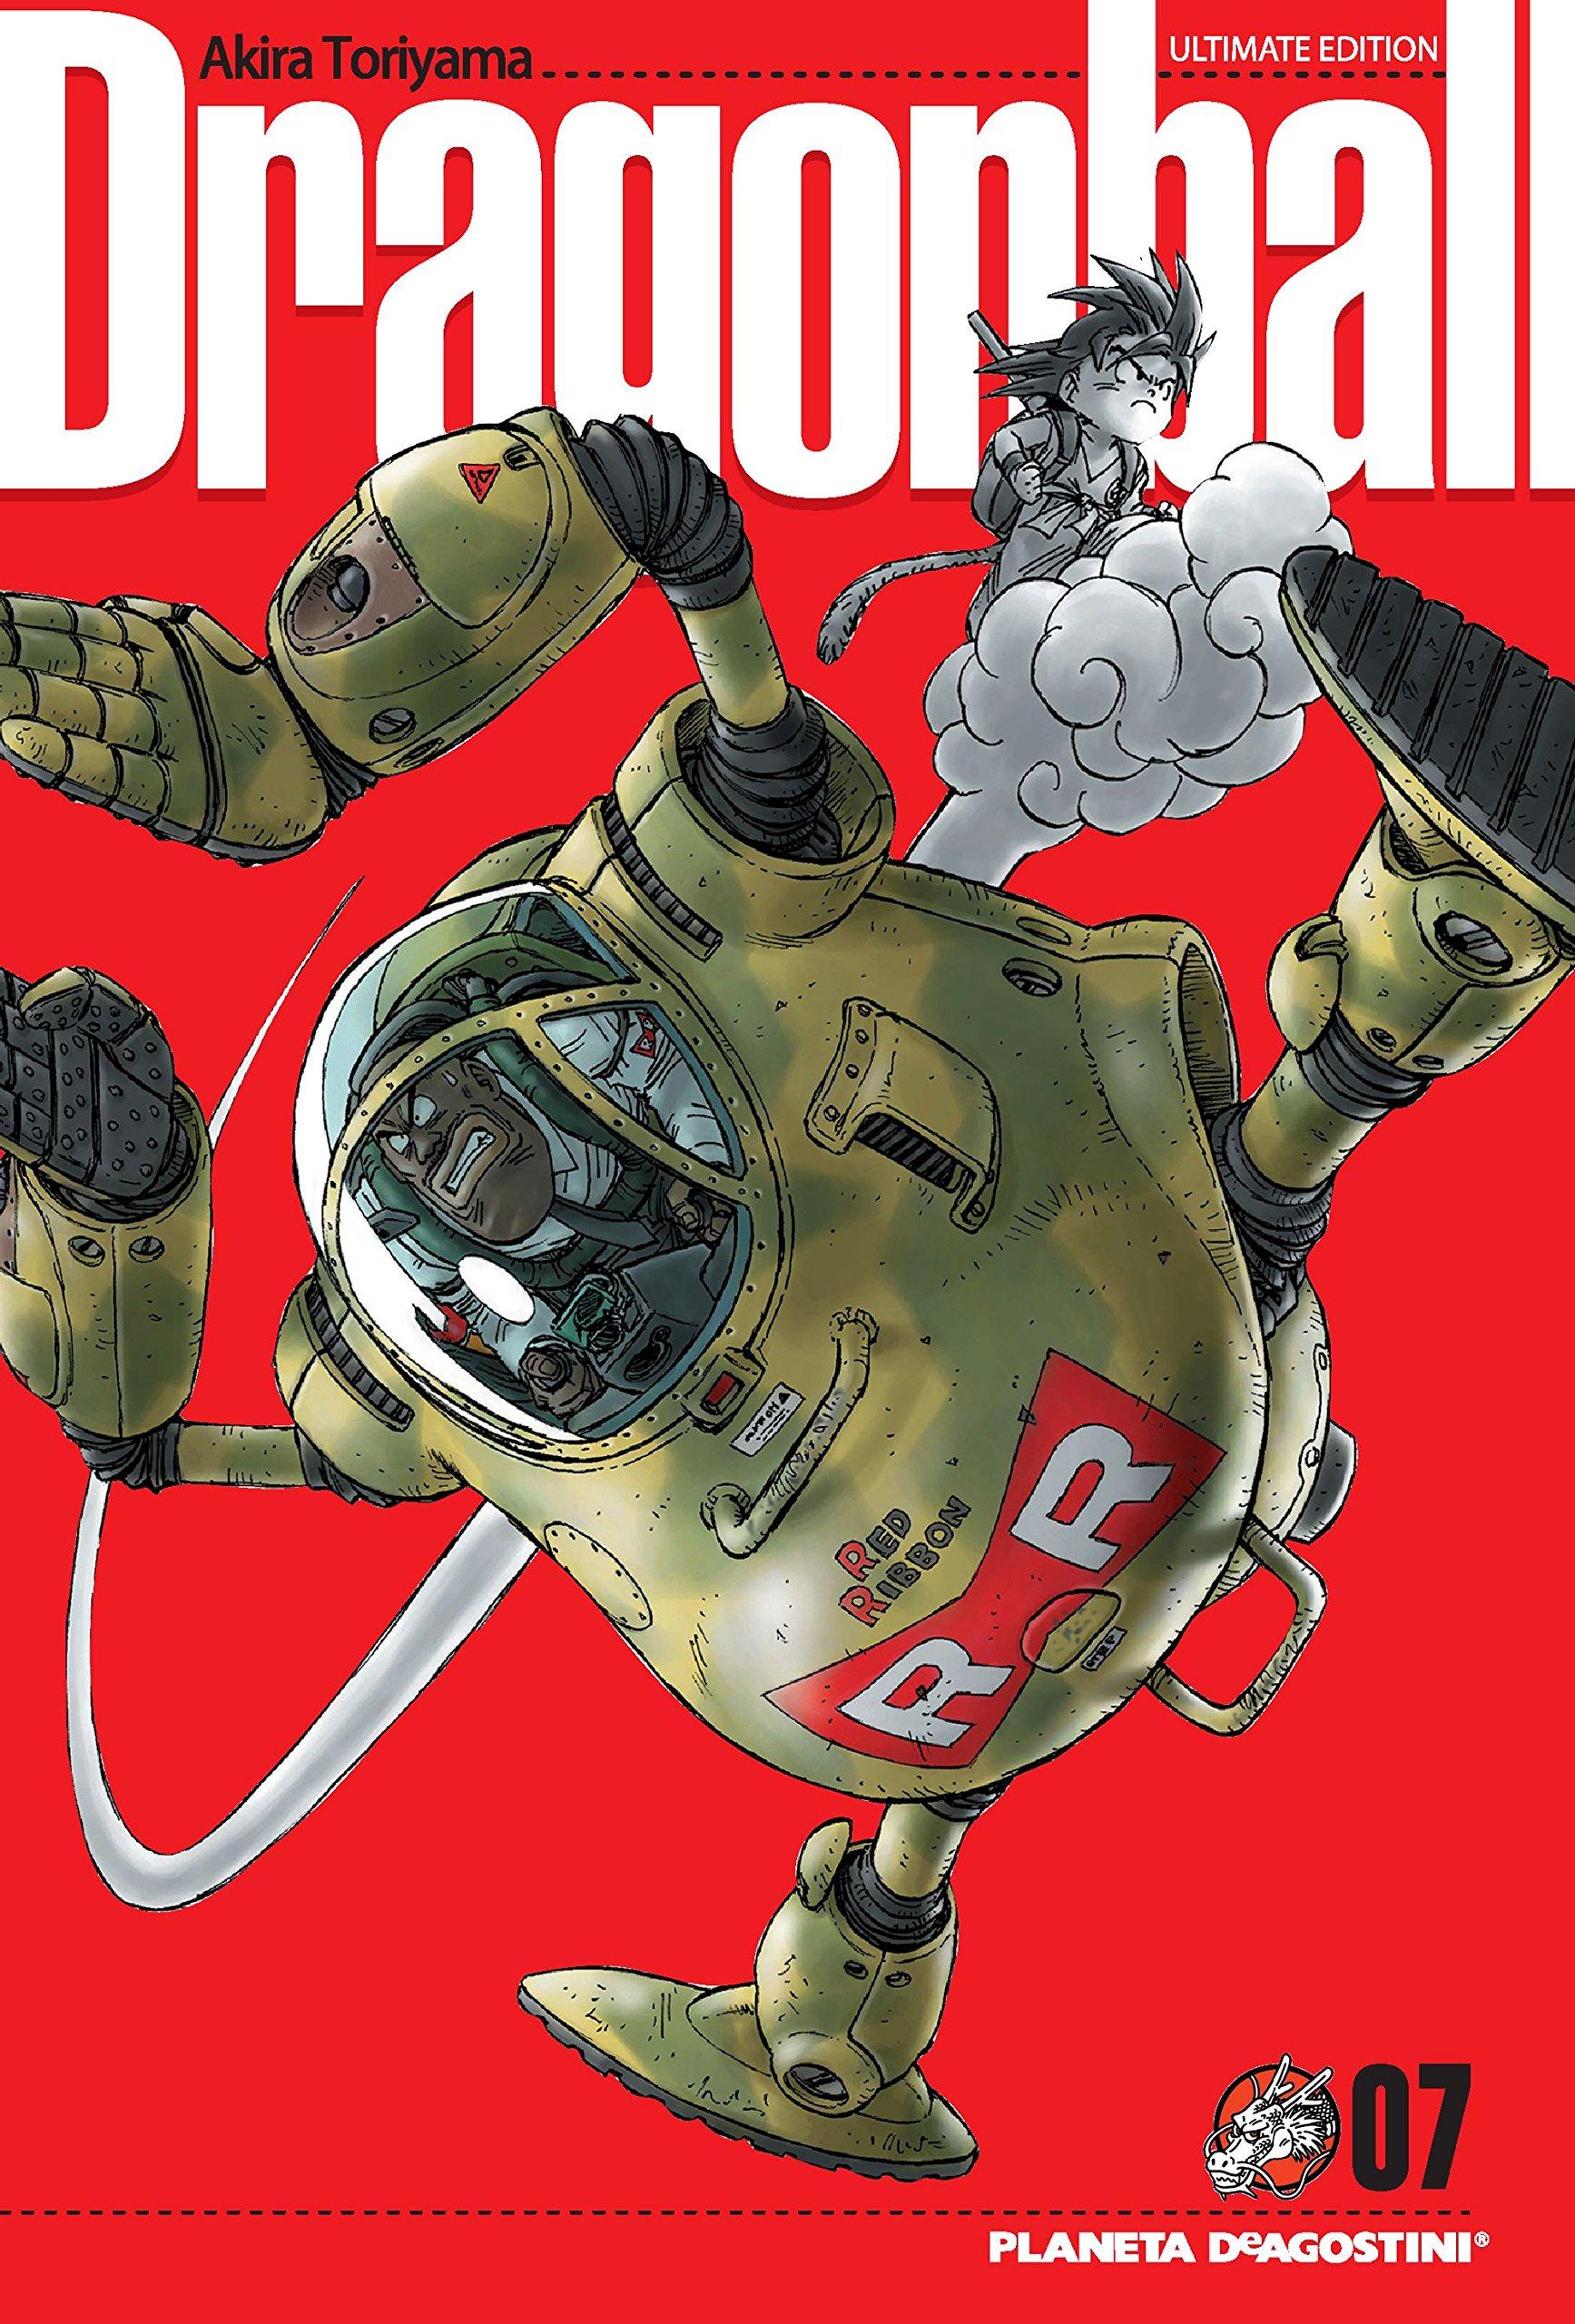 Dragon Ball nº 07/34 (DRAGON BALL ULTIMATE) Tapa blanda – 13 nov 2007 Akira Toriyama Planeta DeAgostini Cómics 8468470406 Cómics y novelas gráficas